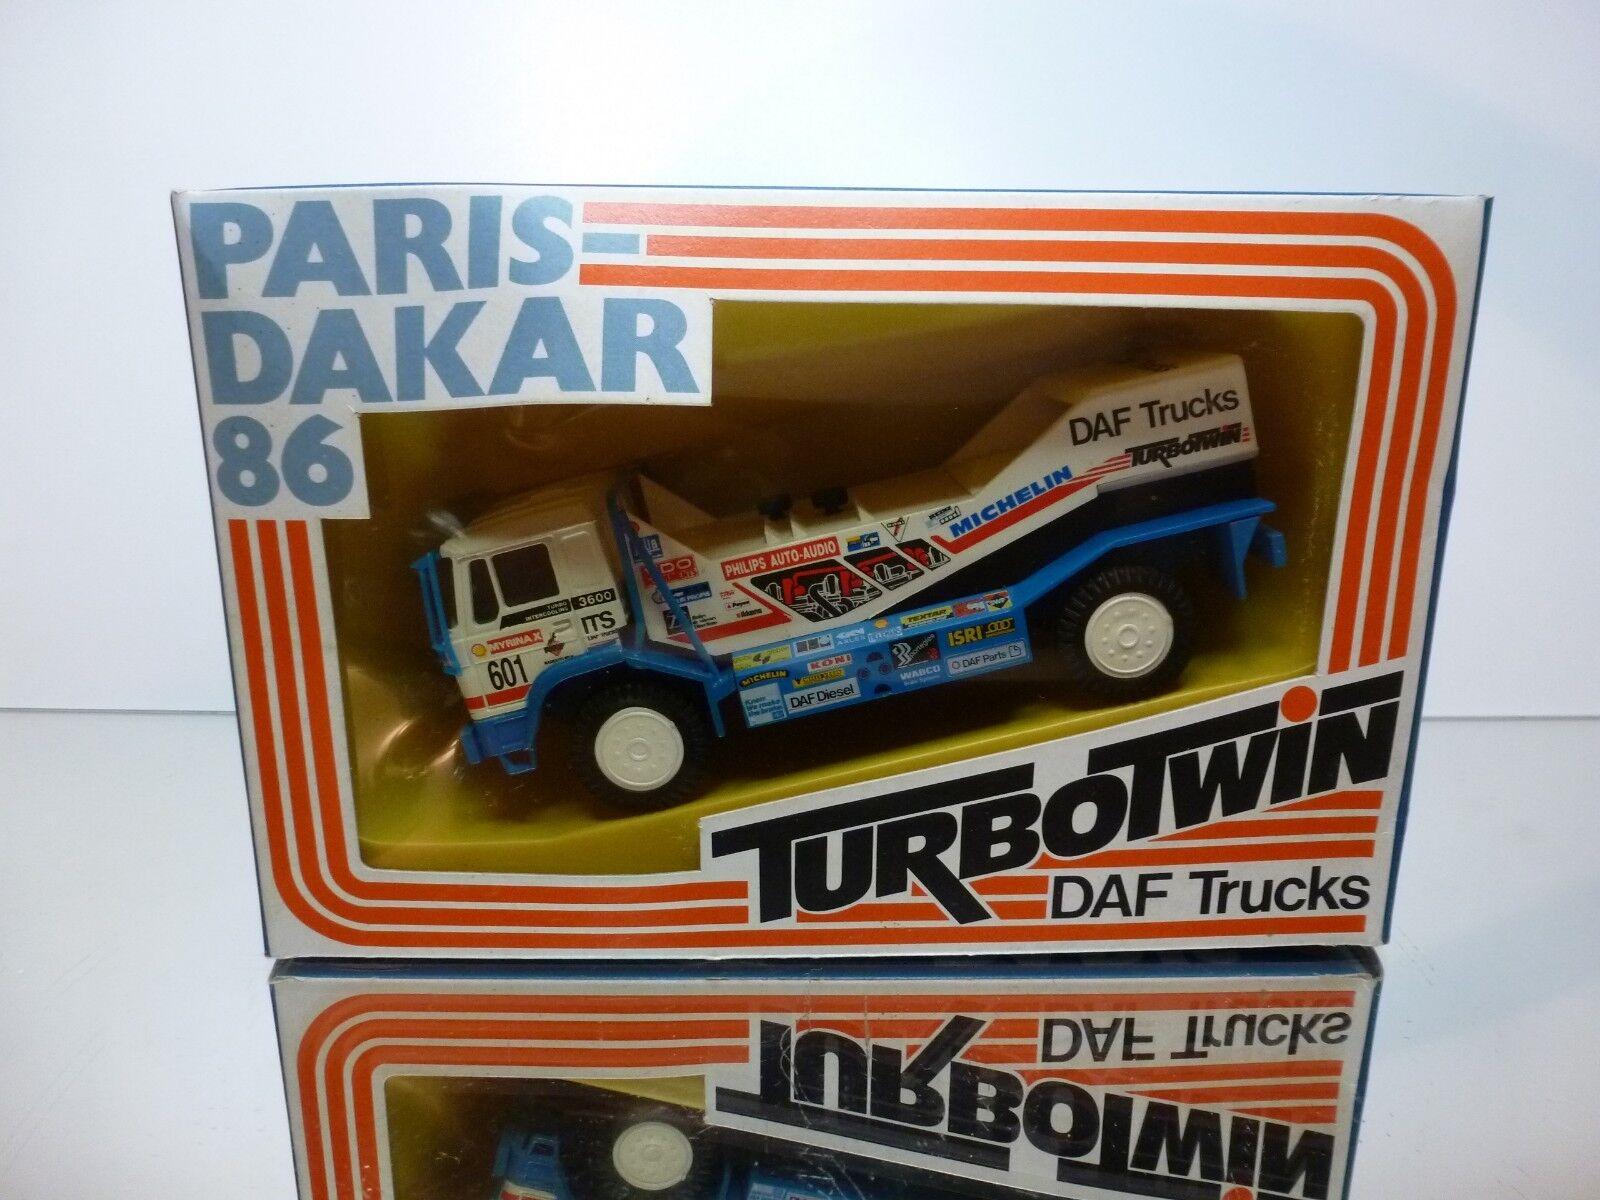 PORTEGIES DAF TURBOTWIN  PARIS DAKAR 86 - DE ROOY 1 50 - GOOD CONDITION IN BOX